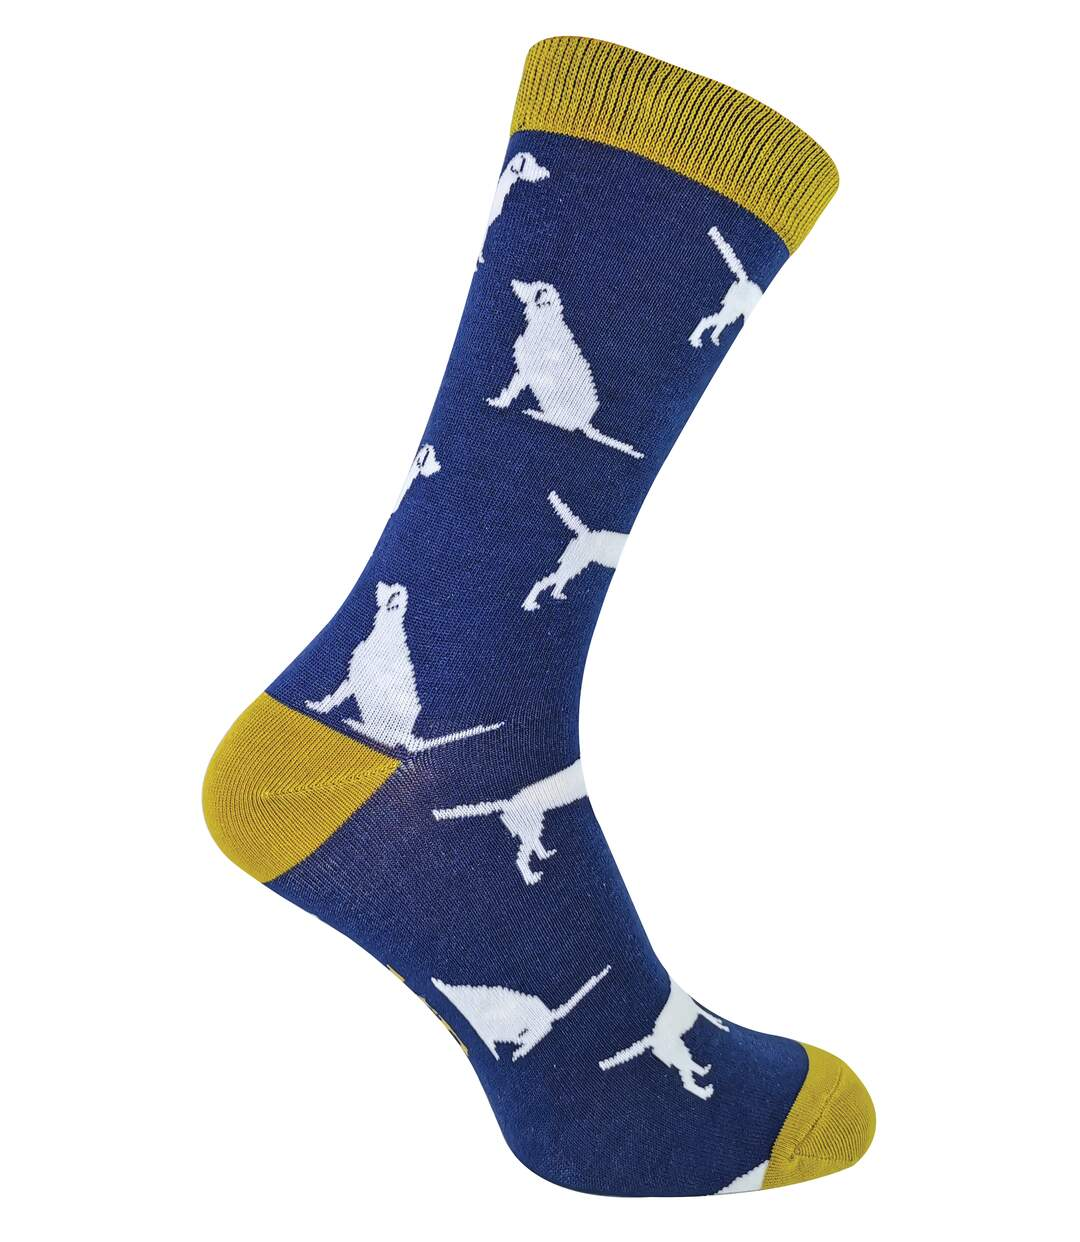 MR HERON - Mens Doggy Soft Bamboo Socks